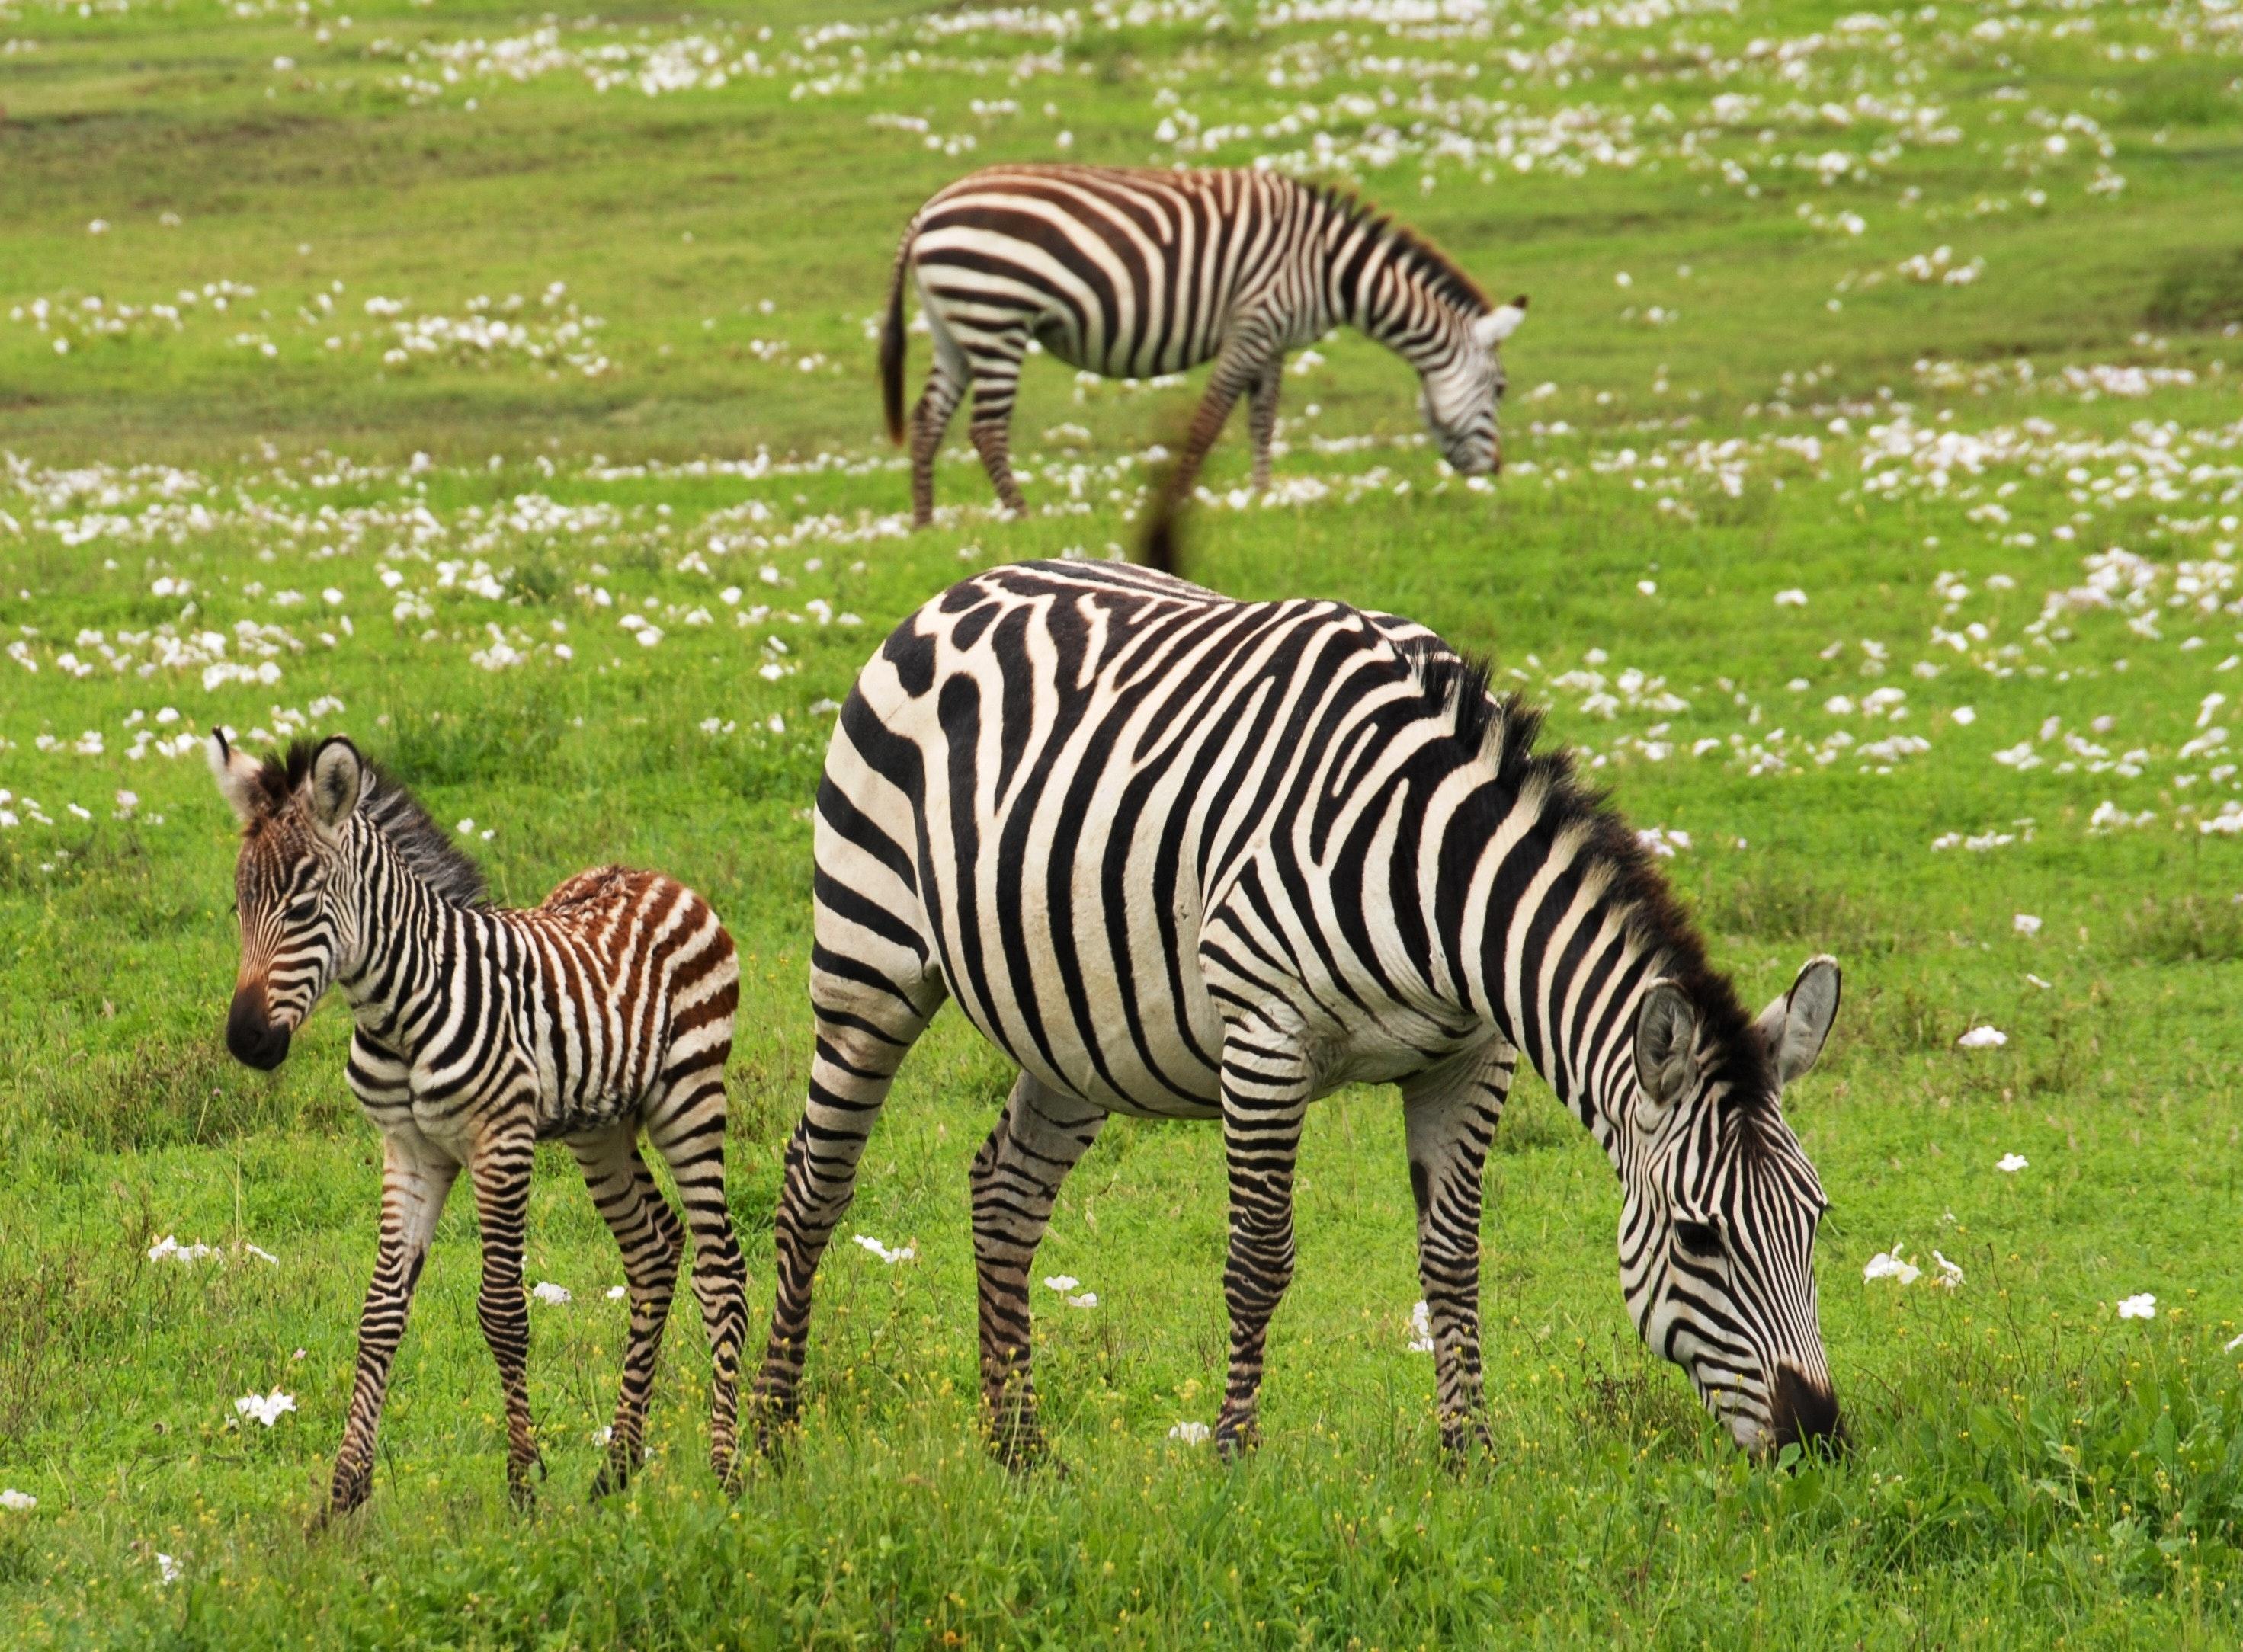 A Zeal of Zebras: An Alphabet of Collective Nouns: Woop Free photos of zebras